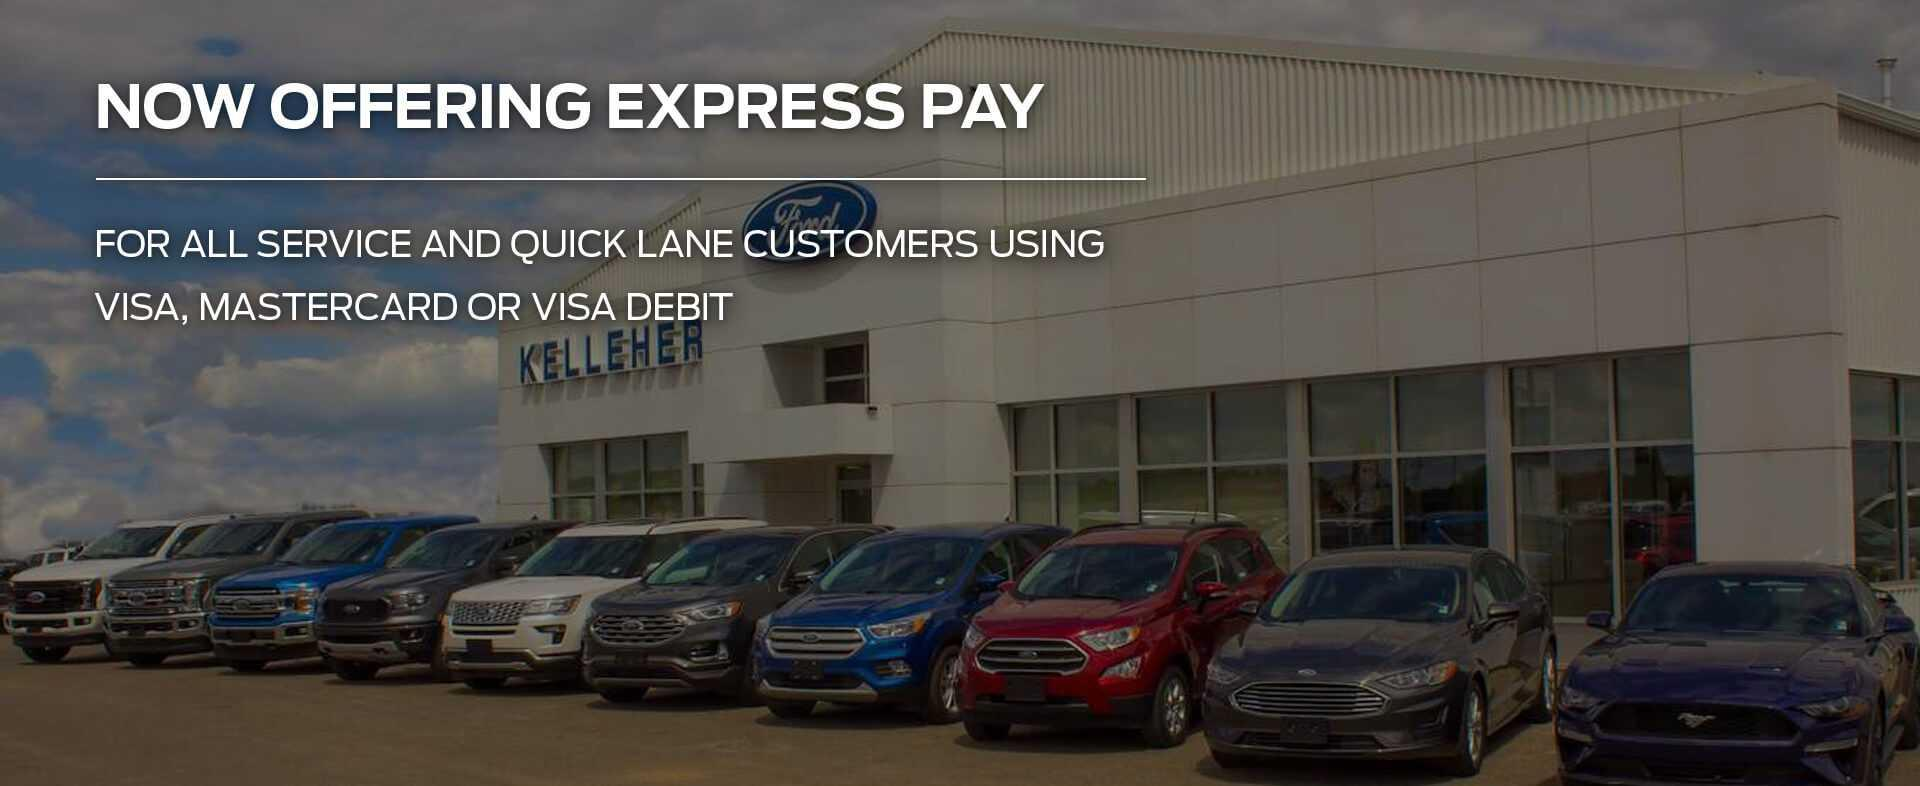 Express payment